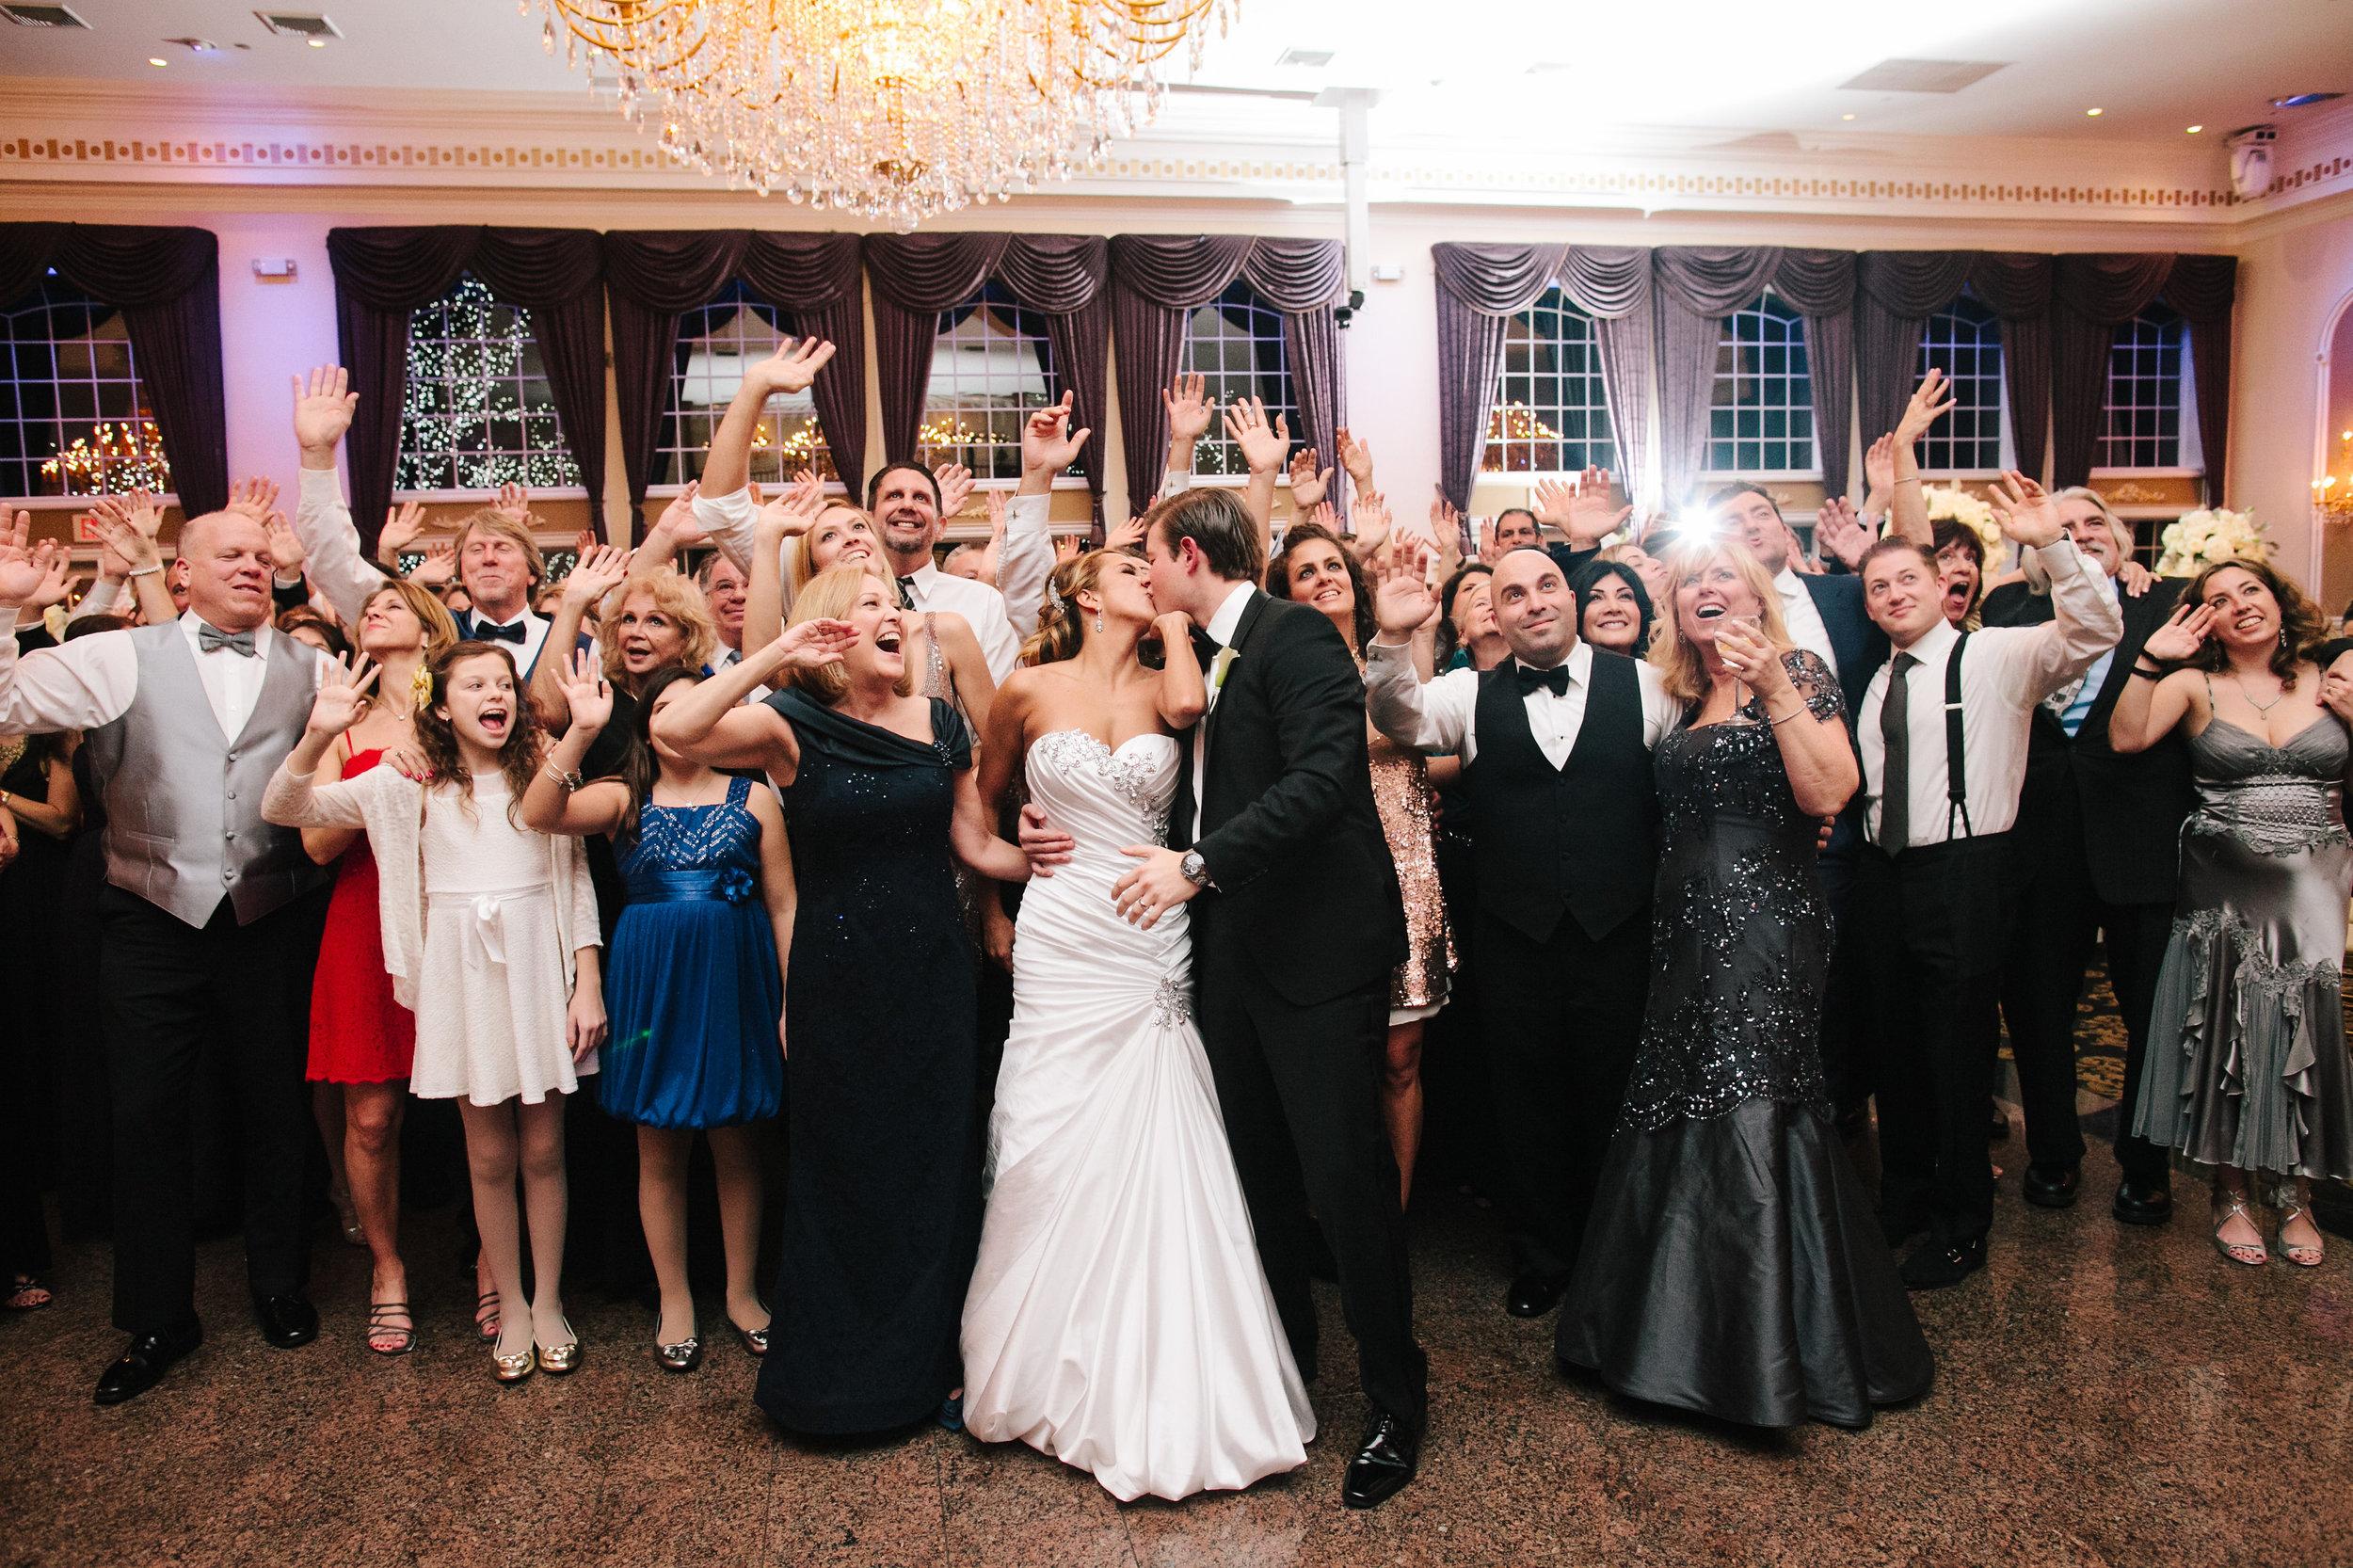 Ceci_New_York_Custom_Invitation_ New_Jersey_Wedding_Luxury_Personalized_Ceci_Style_Bride_Foil_Stamping172.JPG